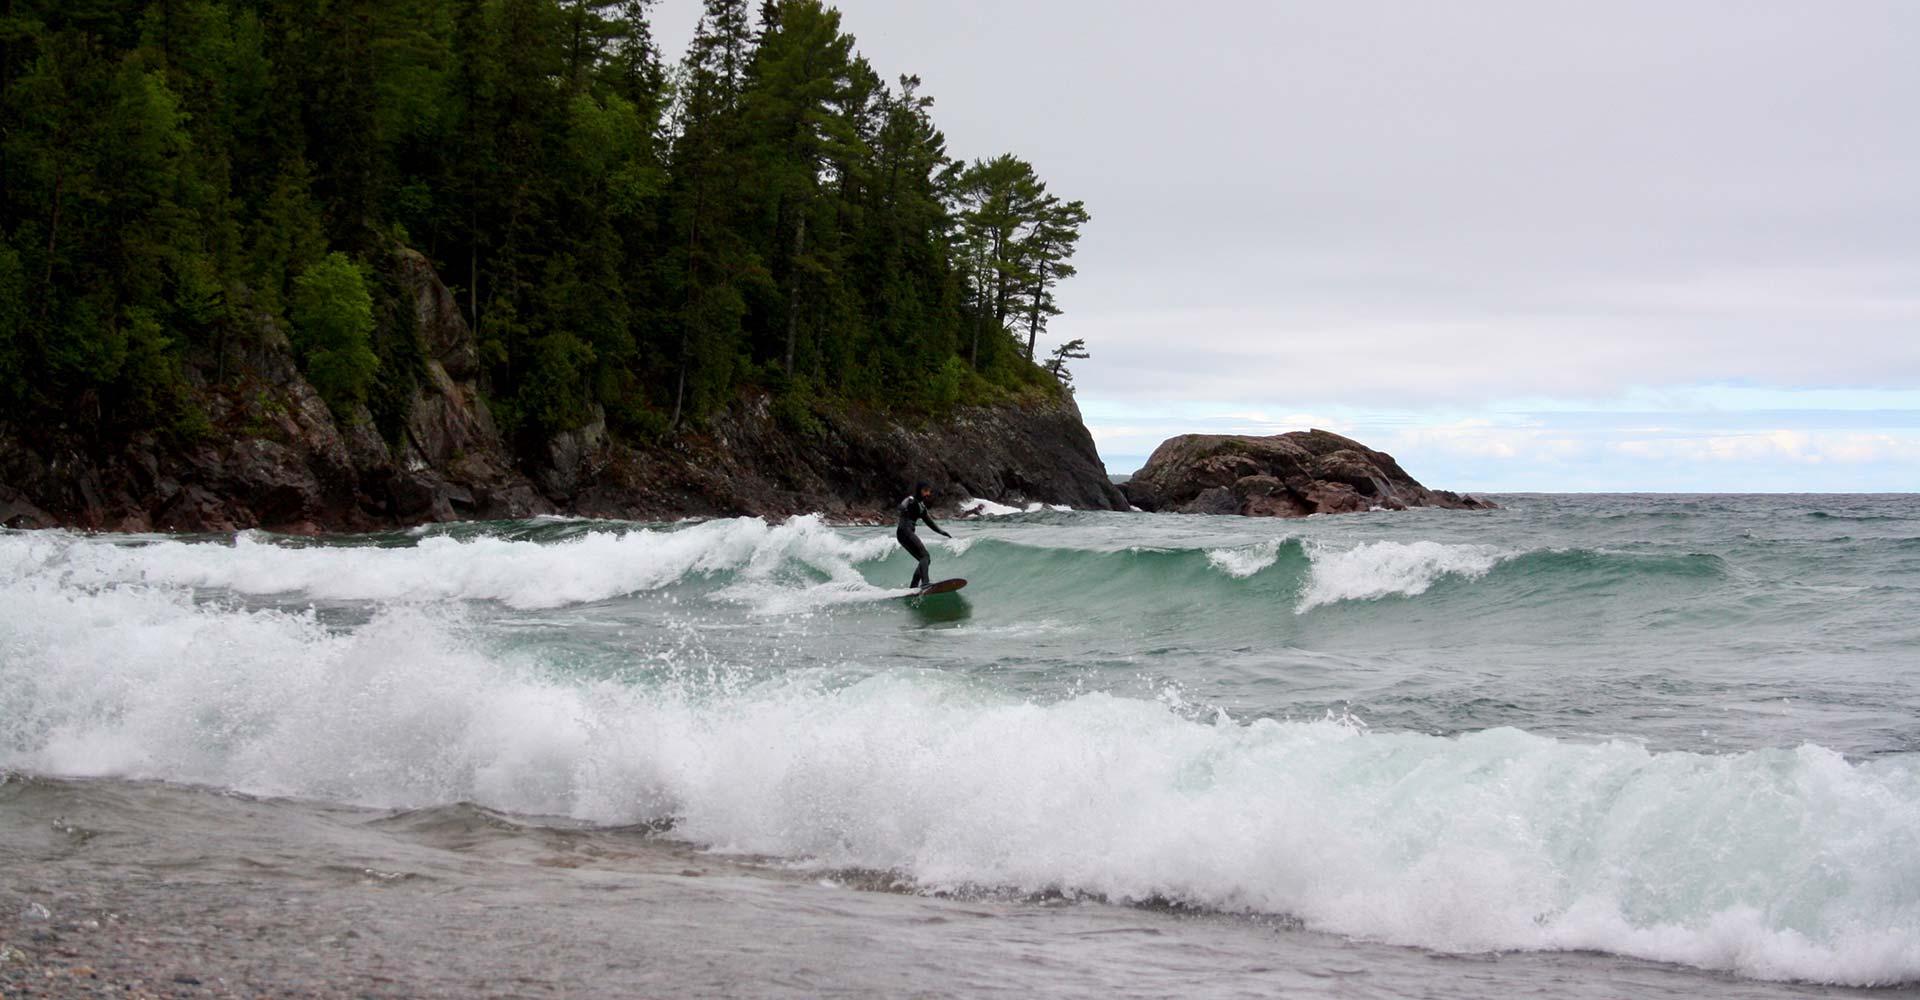 surfing-on-lake-superior